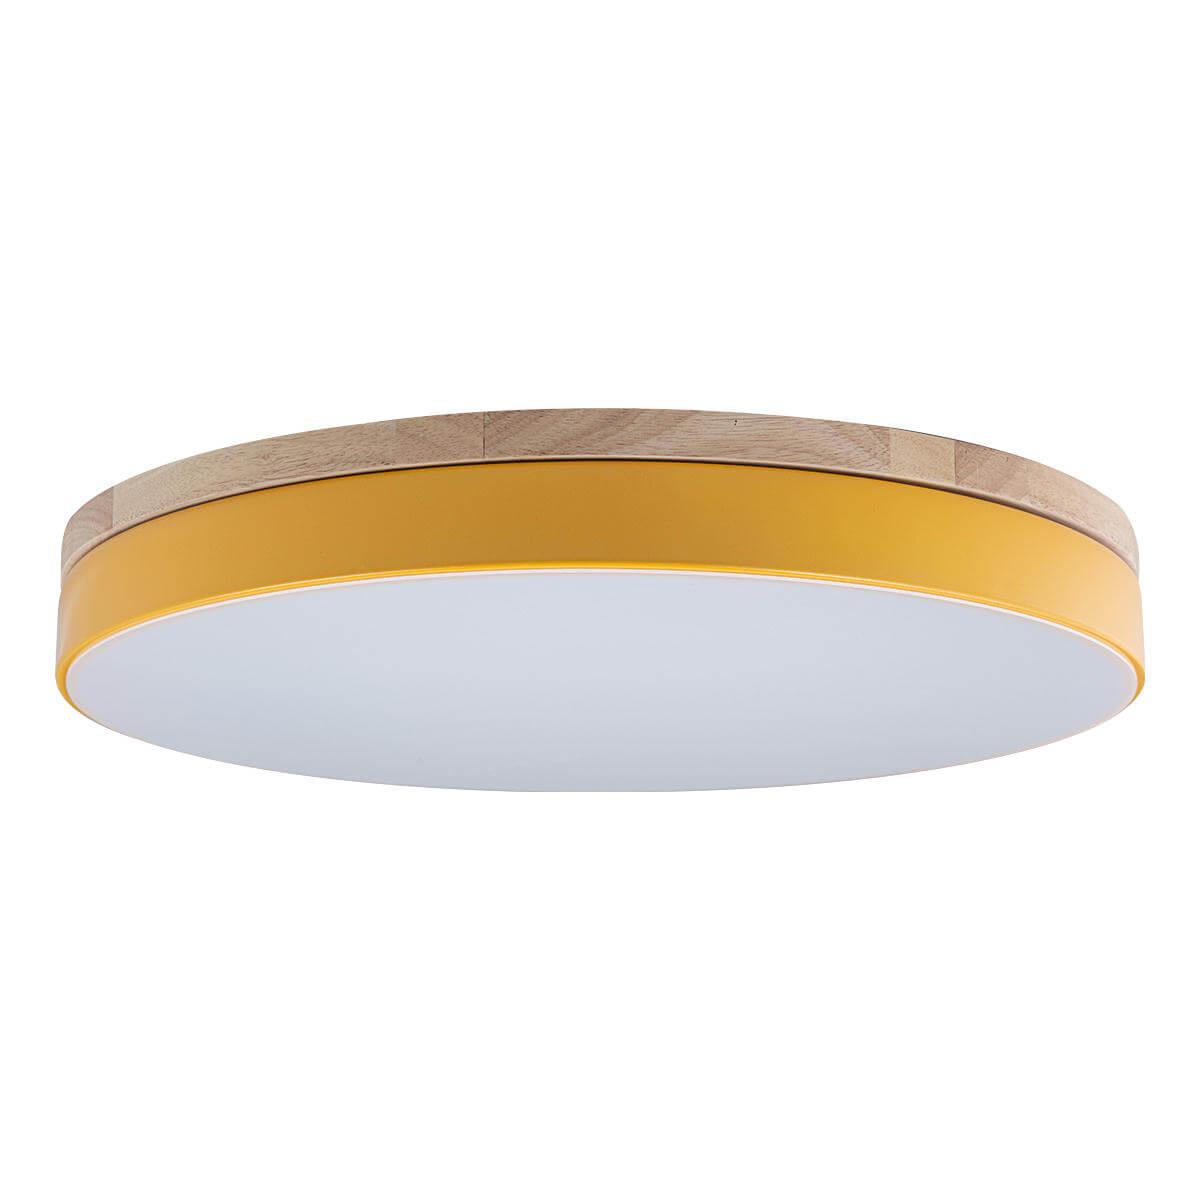 Светильник Loft IT 10001/36 Yellow Axel